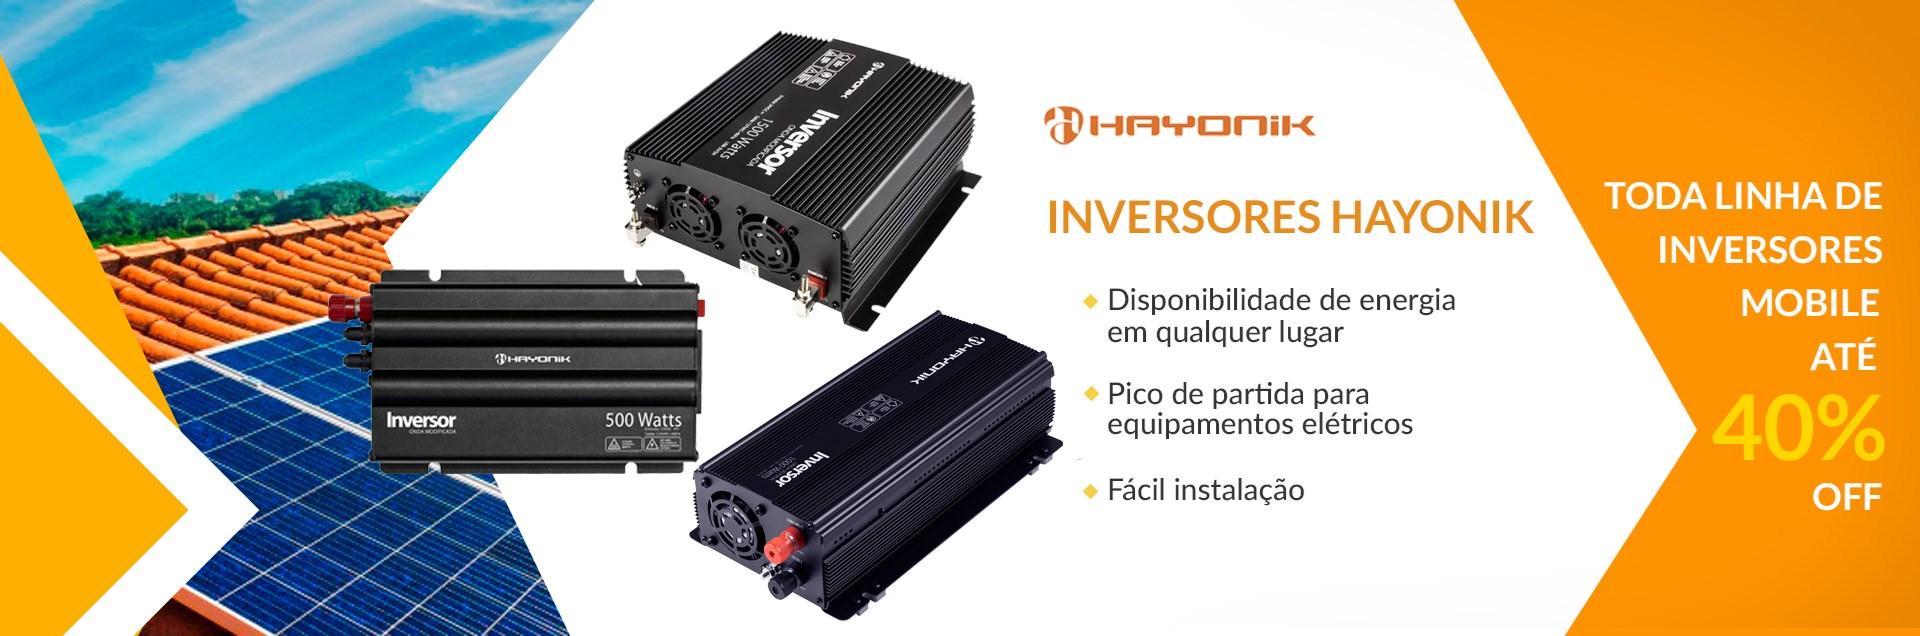 Inversor Hayonik